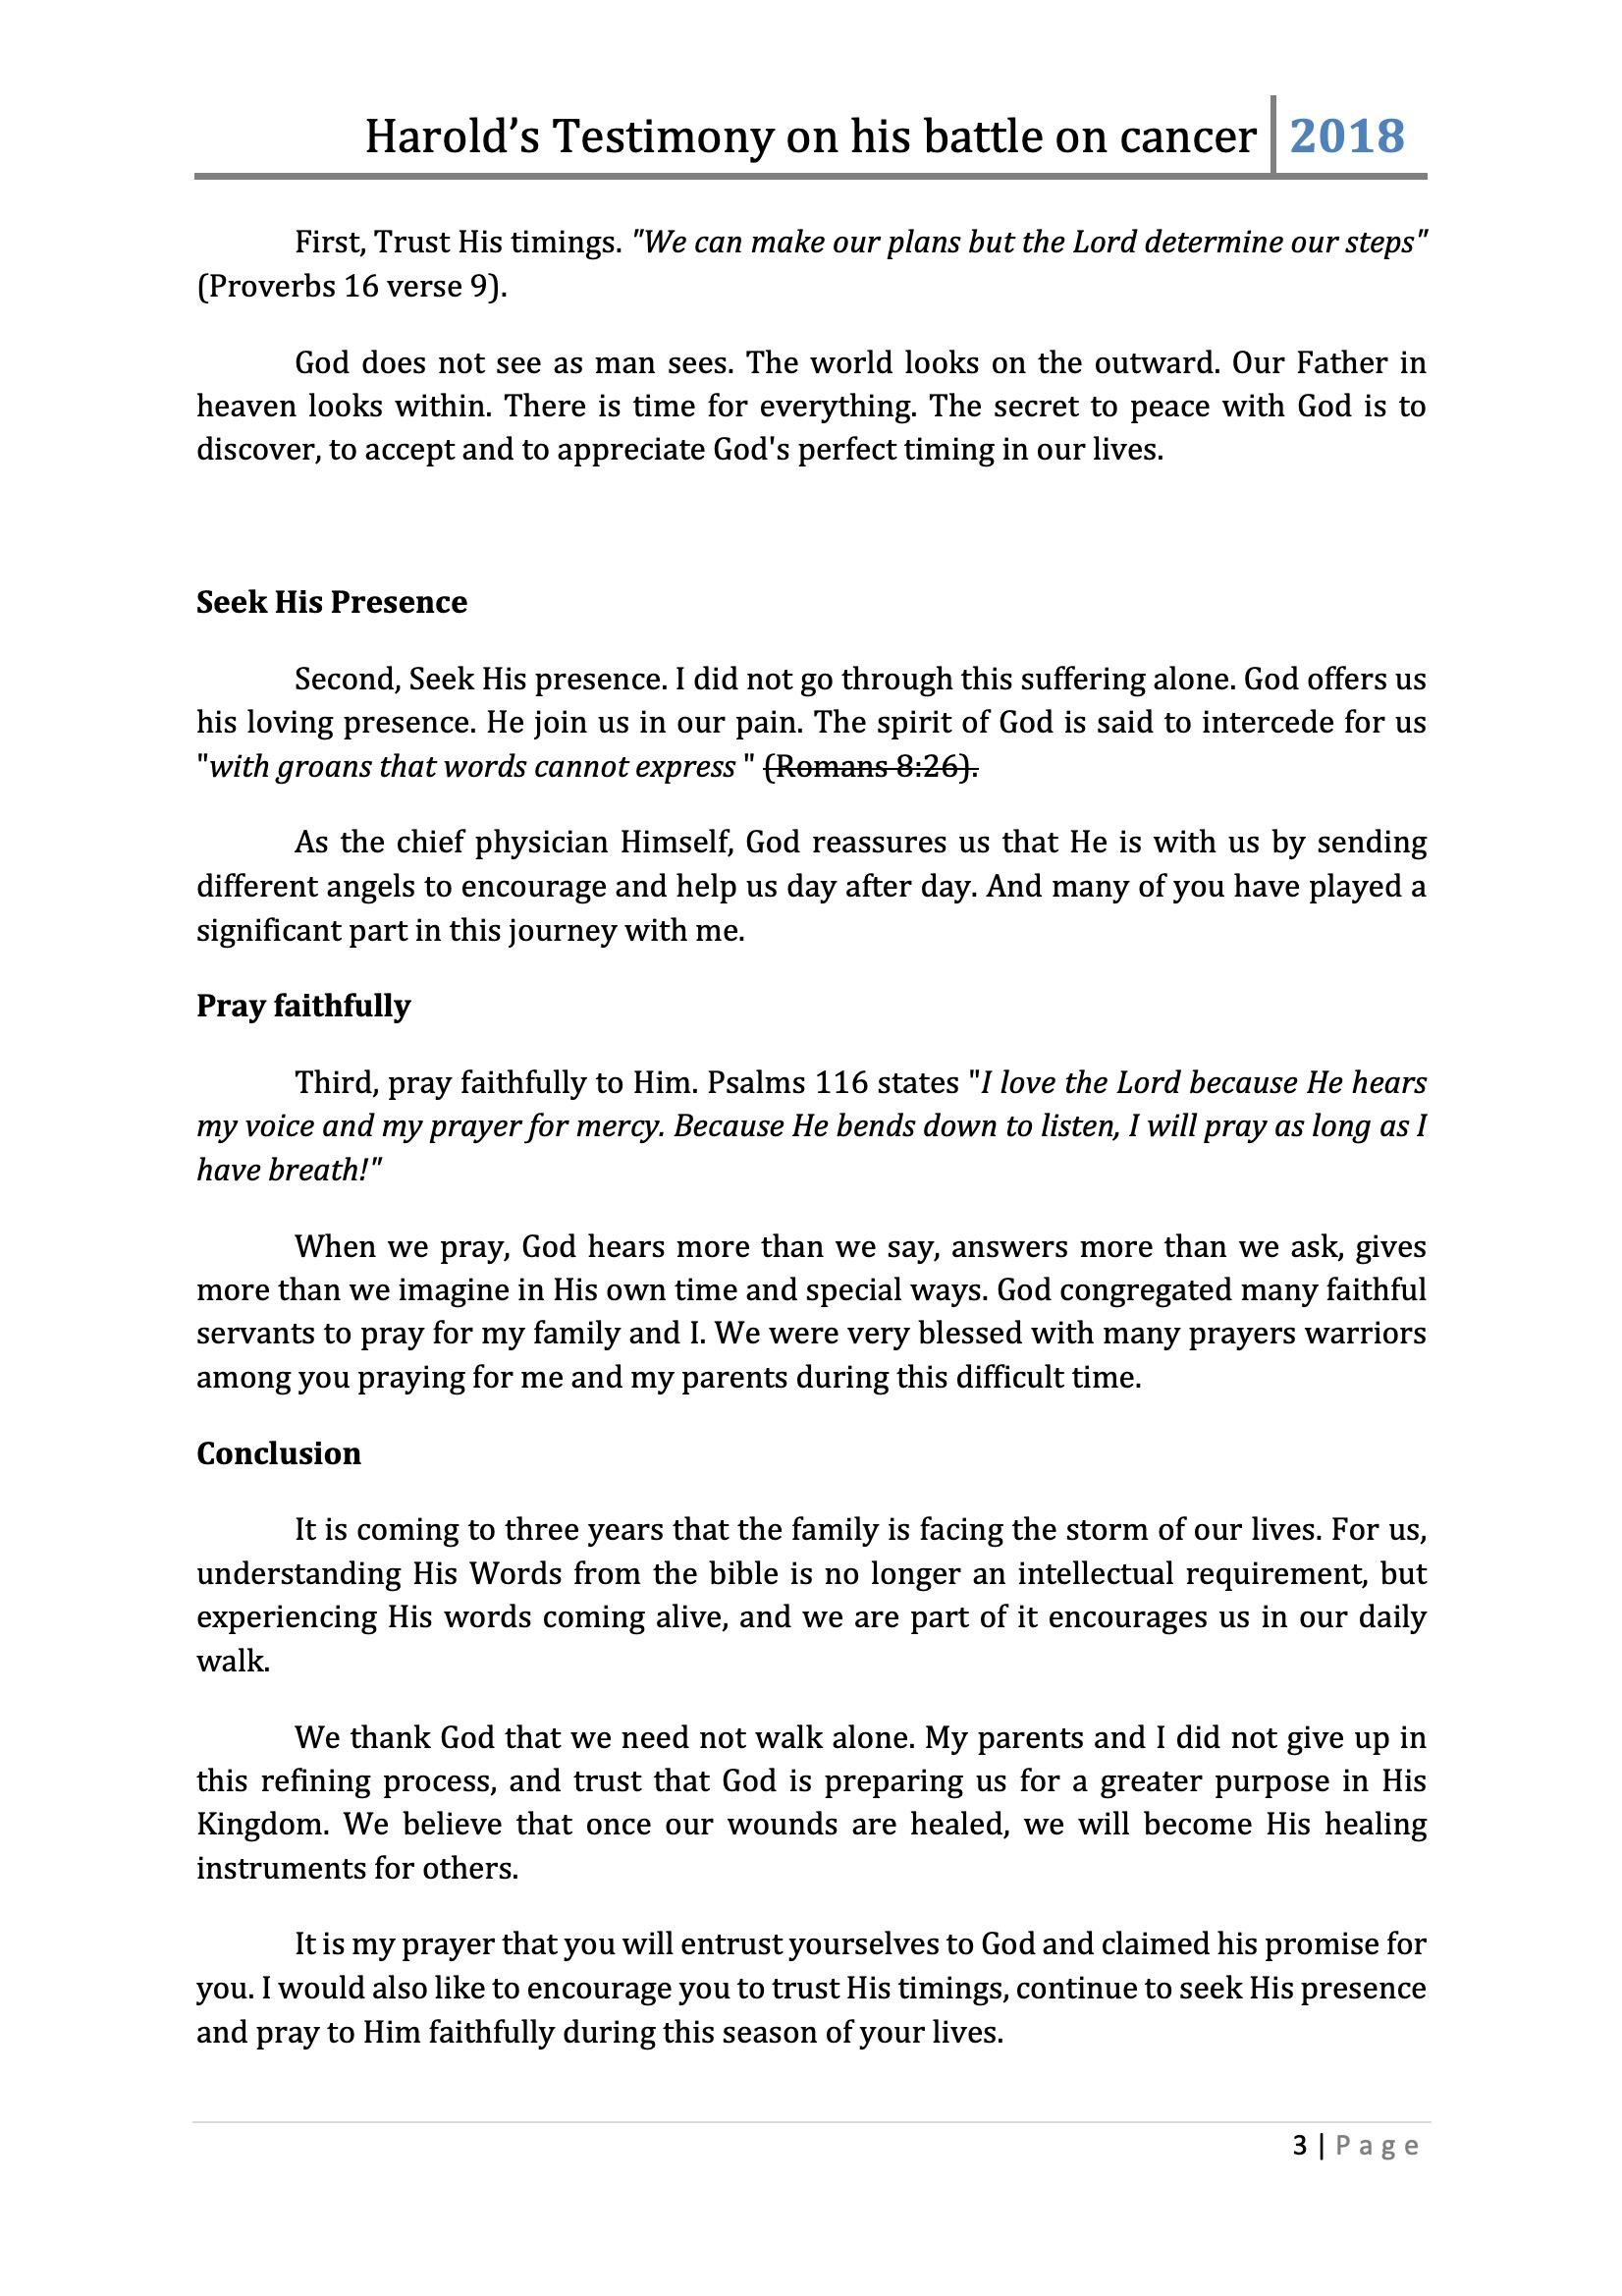 Battling sarcoma_Harold_testimony 3-3